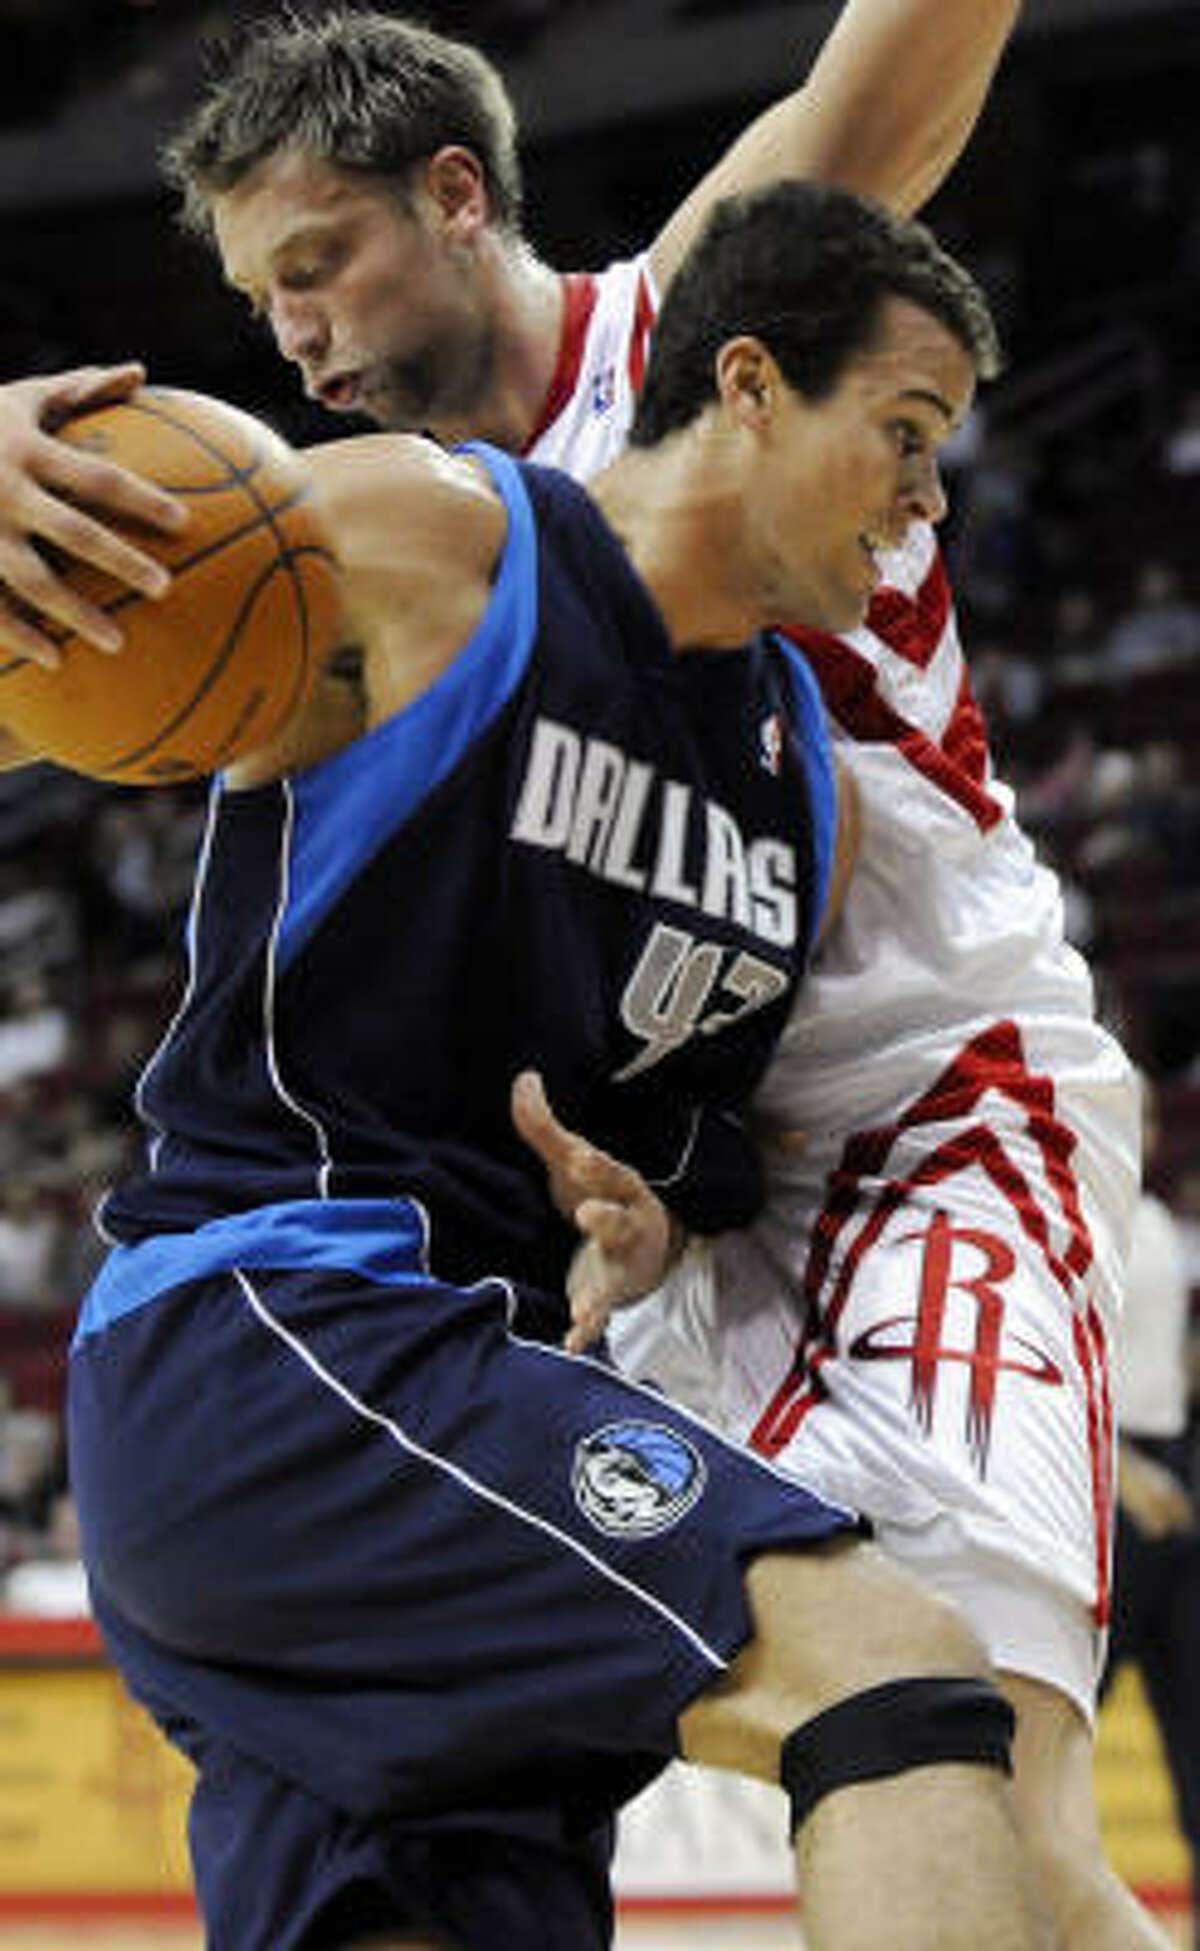 Dallas' Kris Humphries, left, drives the ball against Houston's David Andersen.